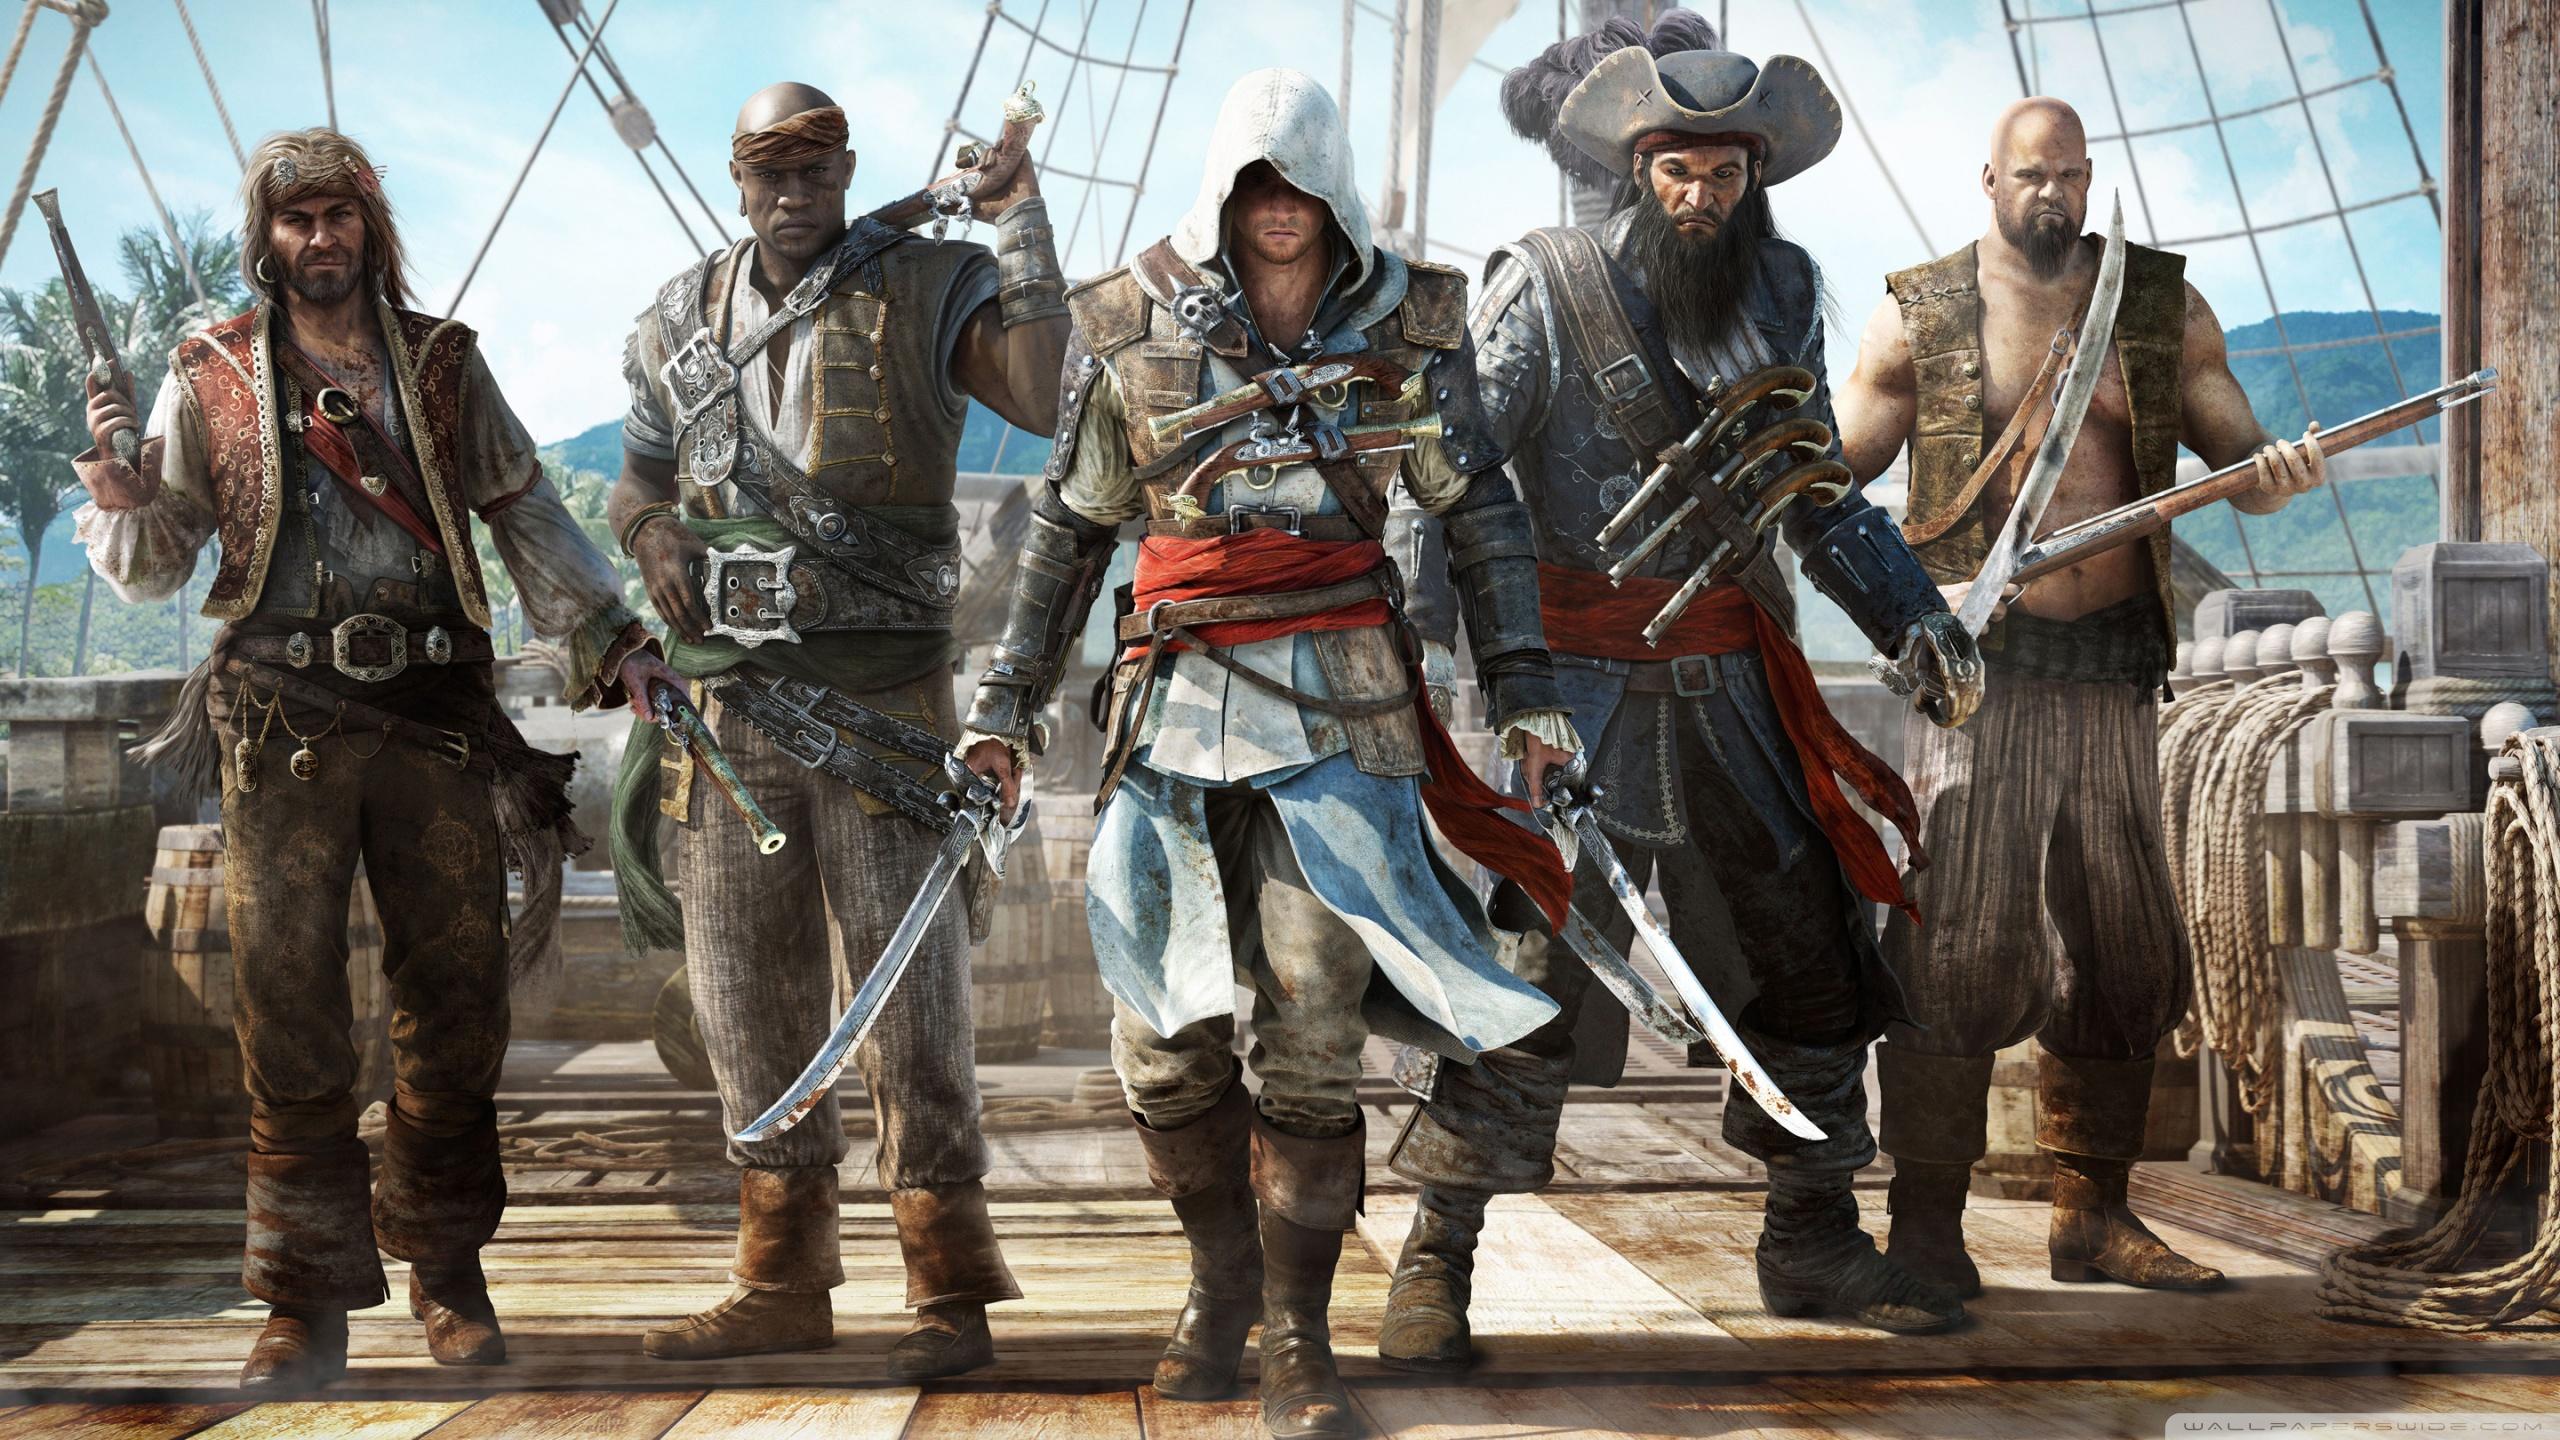 Assassins Creed IV Black Flag 4K HD Desktop Wallpaper for 4K 2560x1440